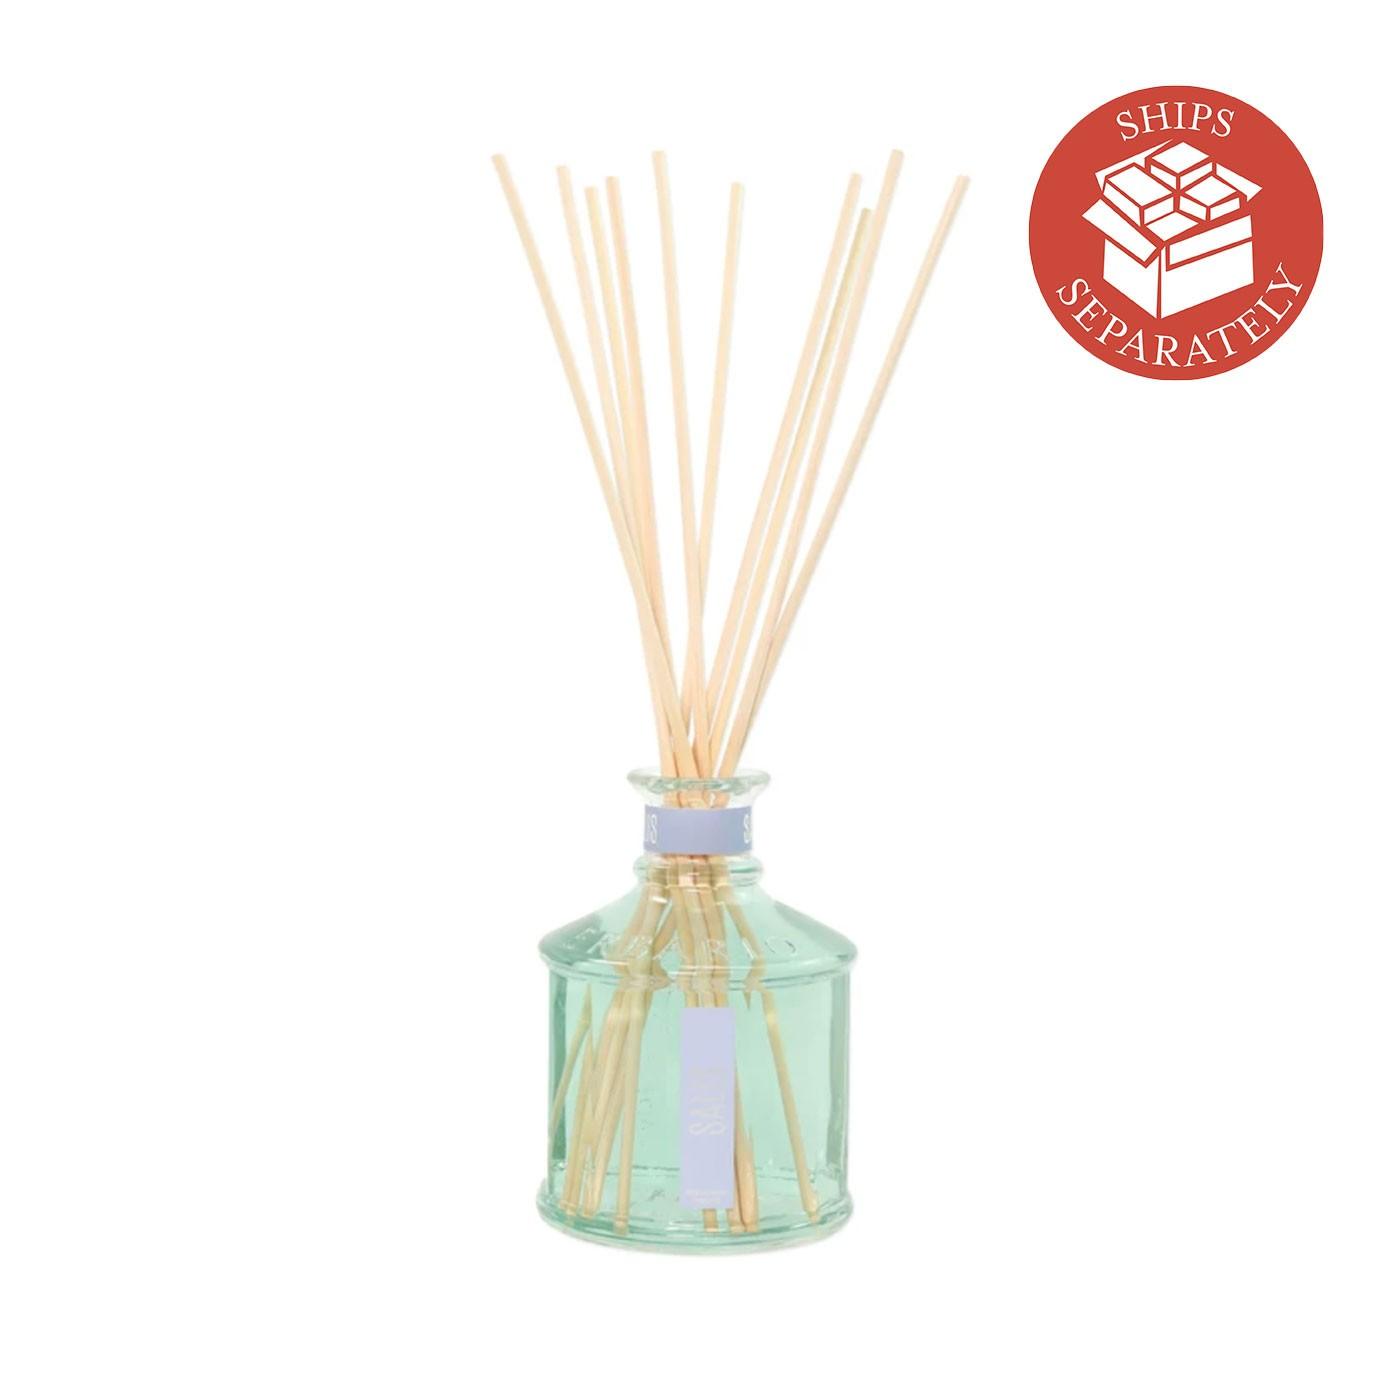 Salis Fragrance Diffuser 8.4 oz - Erbario Toscano   Eataly.com